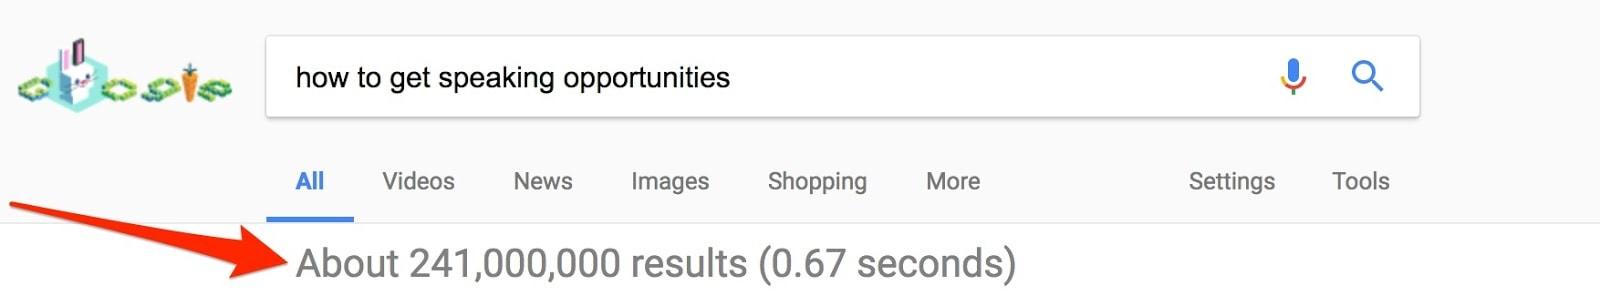 googlehowtogetspeakingopportunities